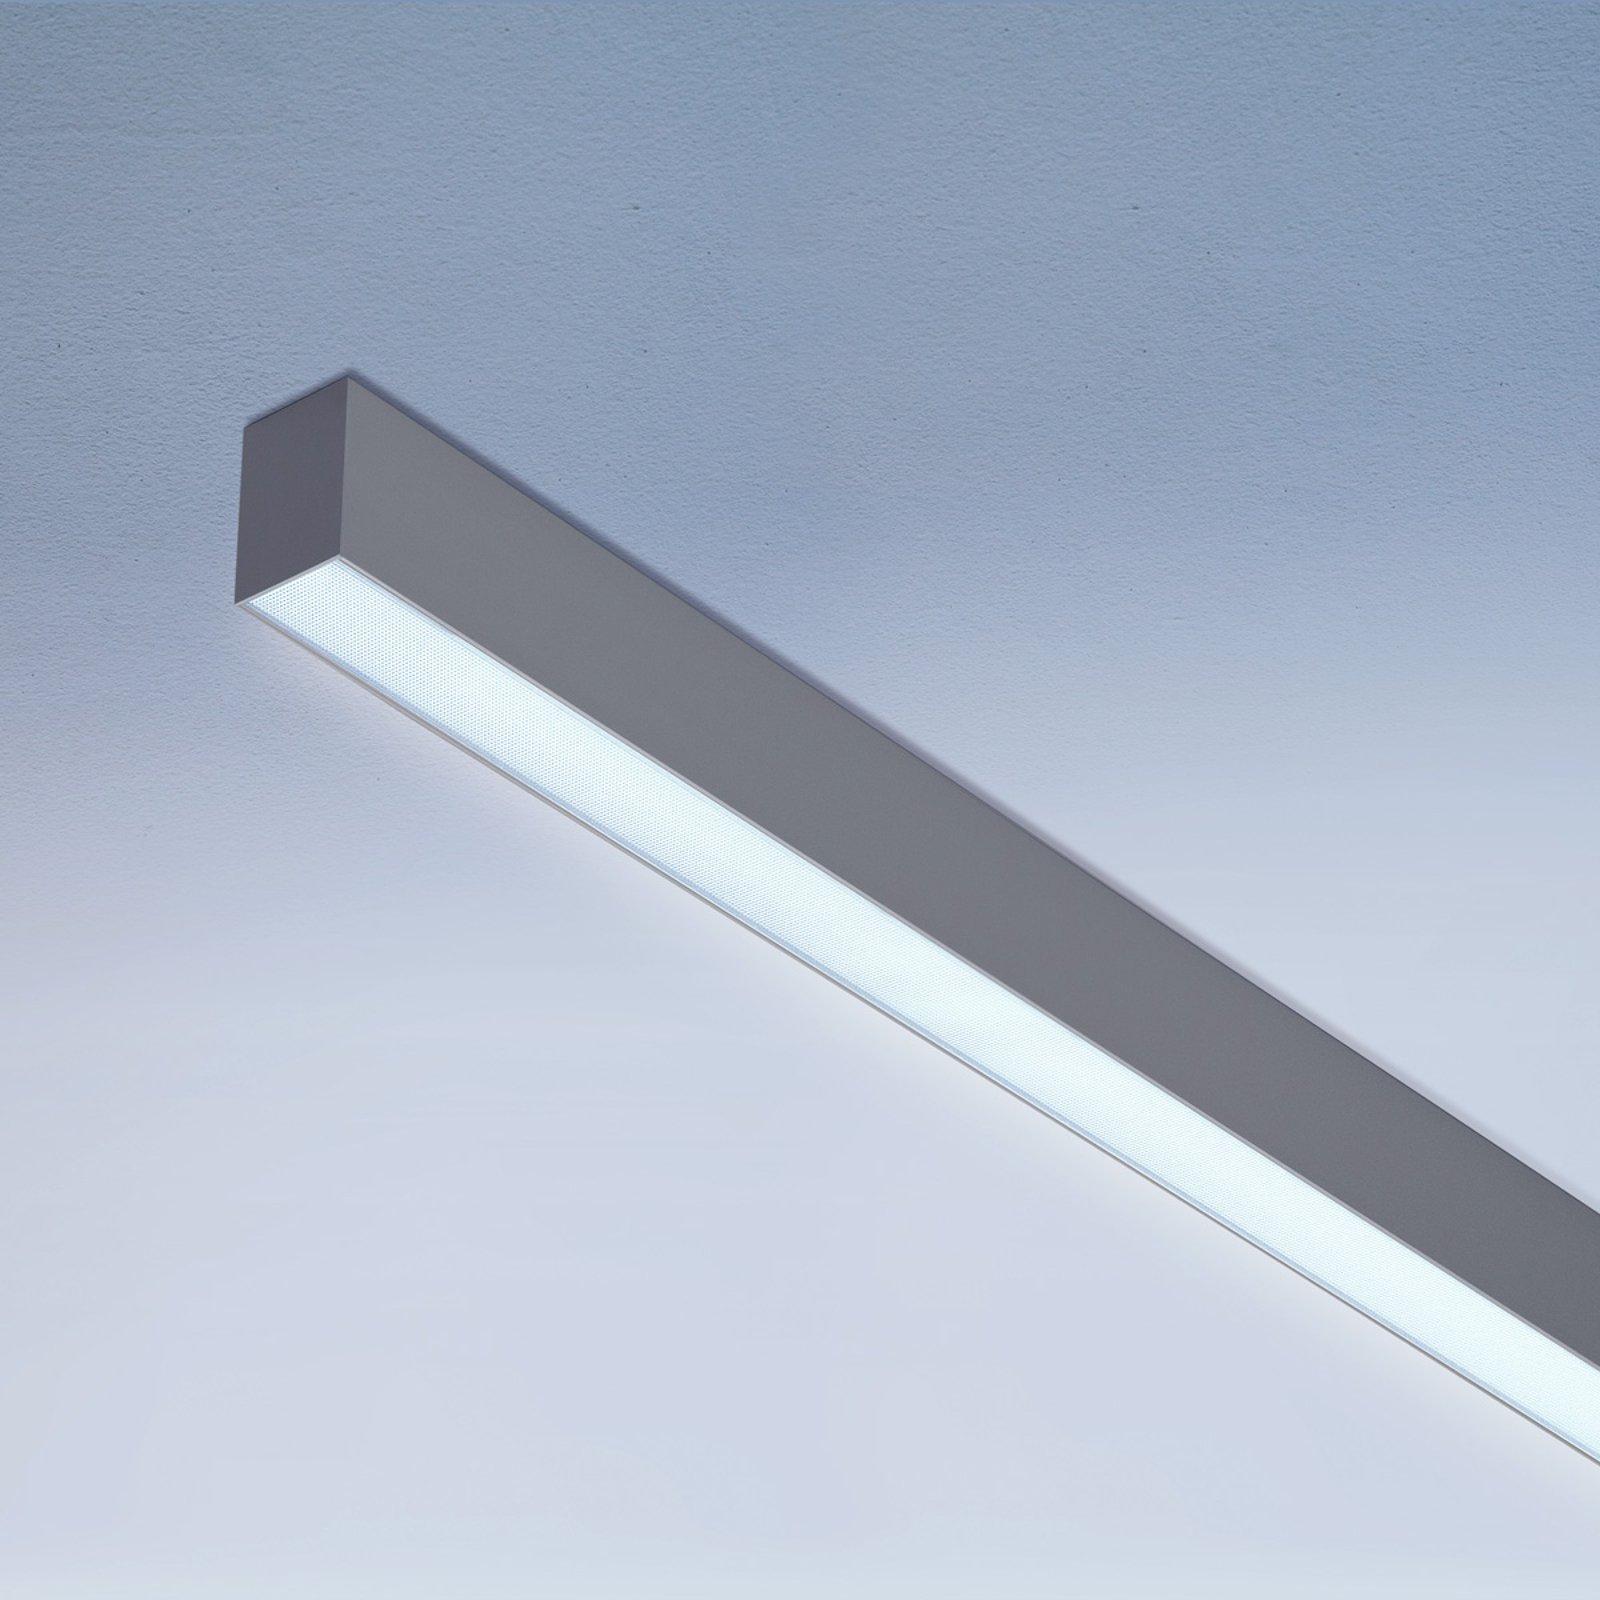 Medium Power Matric-A3 - LED-vegglampe 235 cm